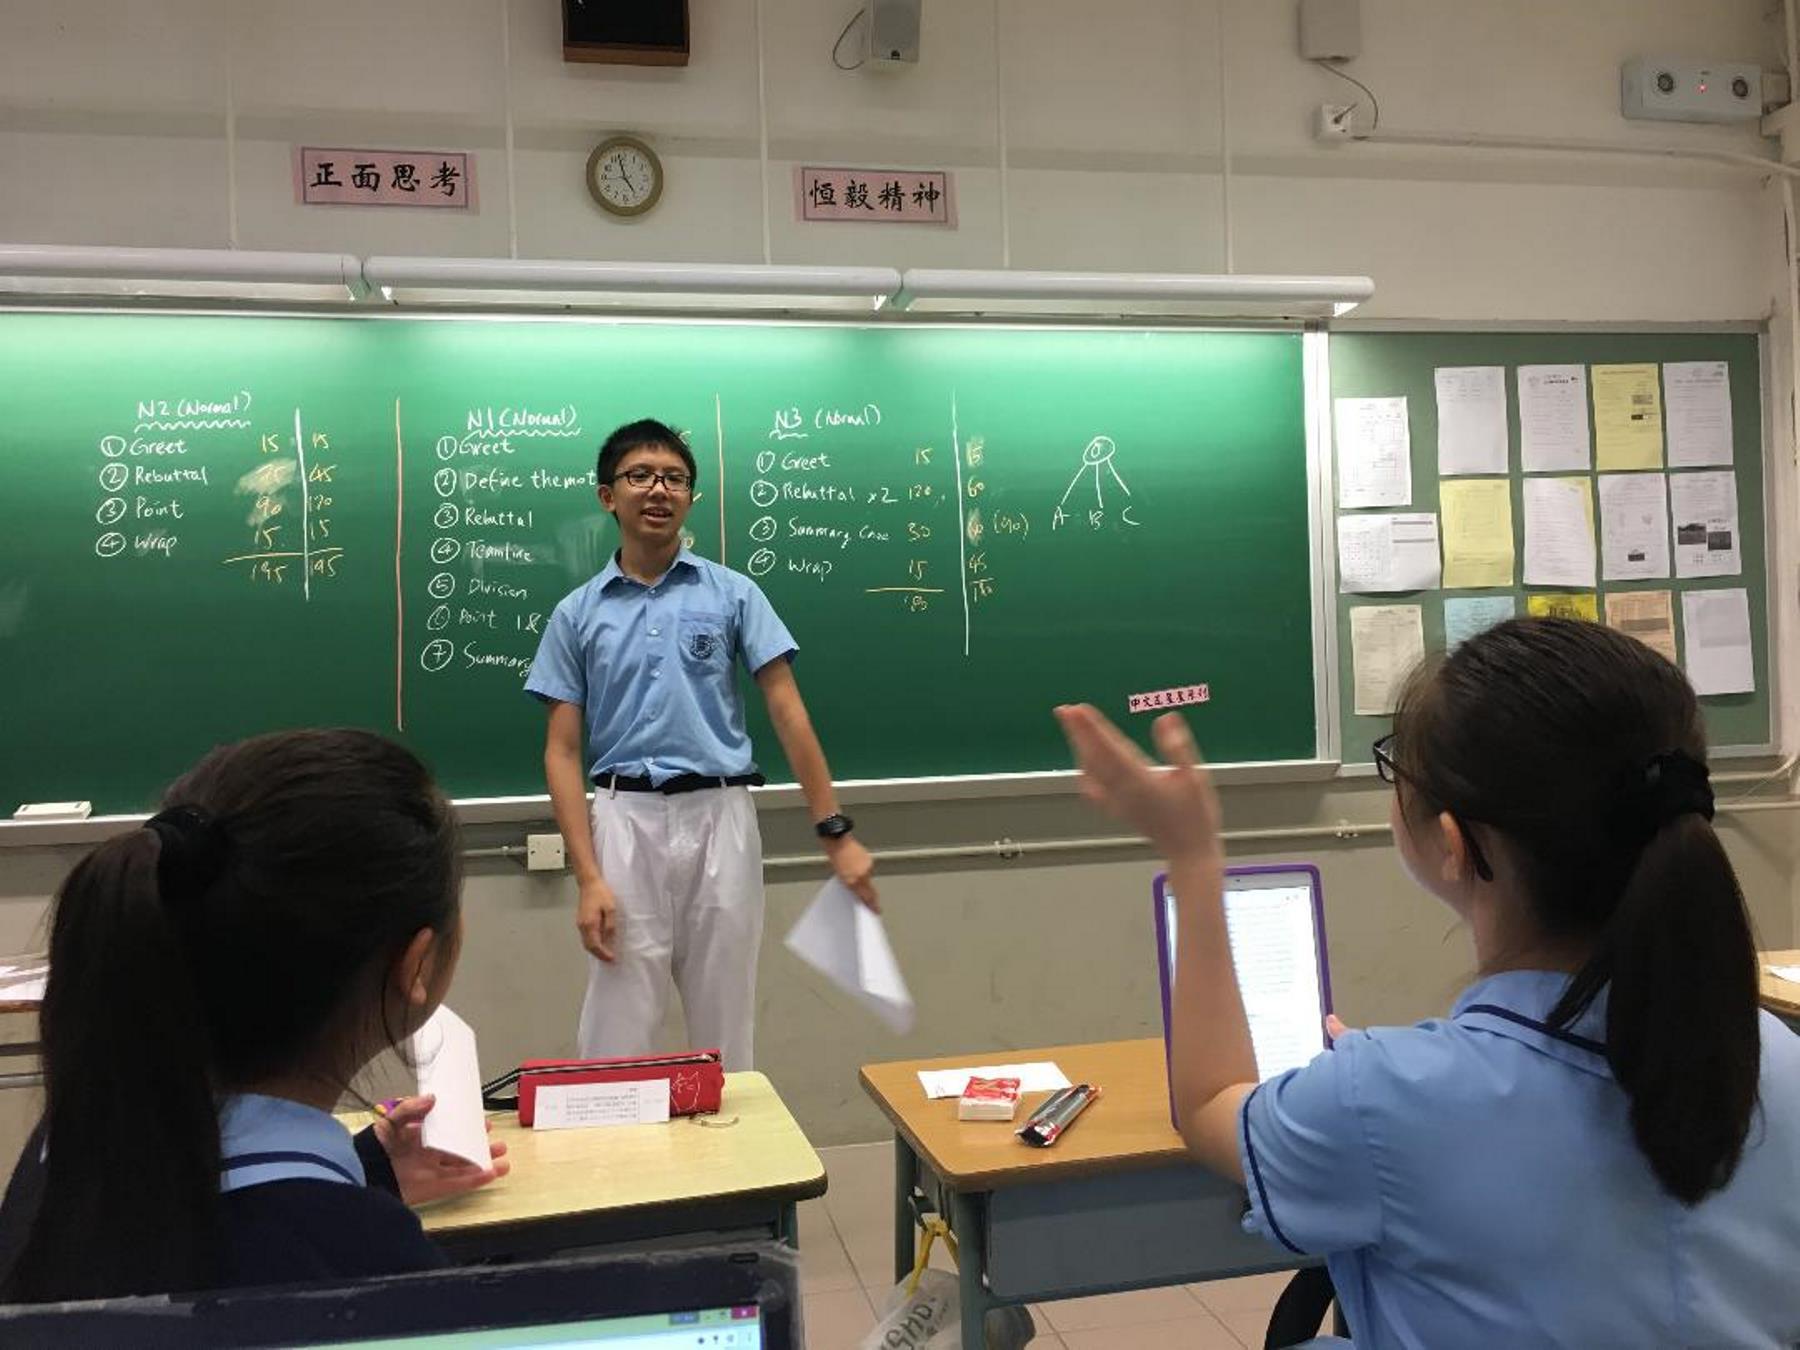 http://www.npc.edu.hk/sites/default/files/thumbnail.jpg